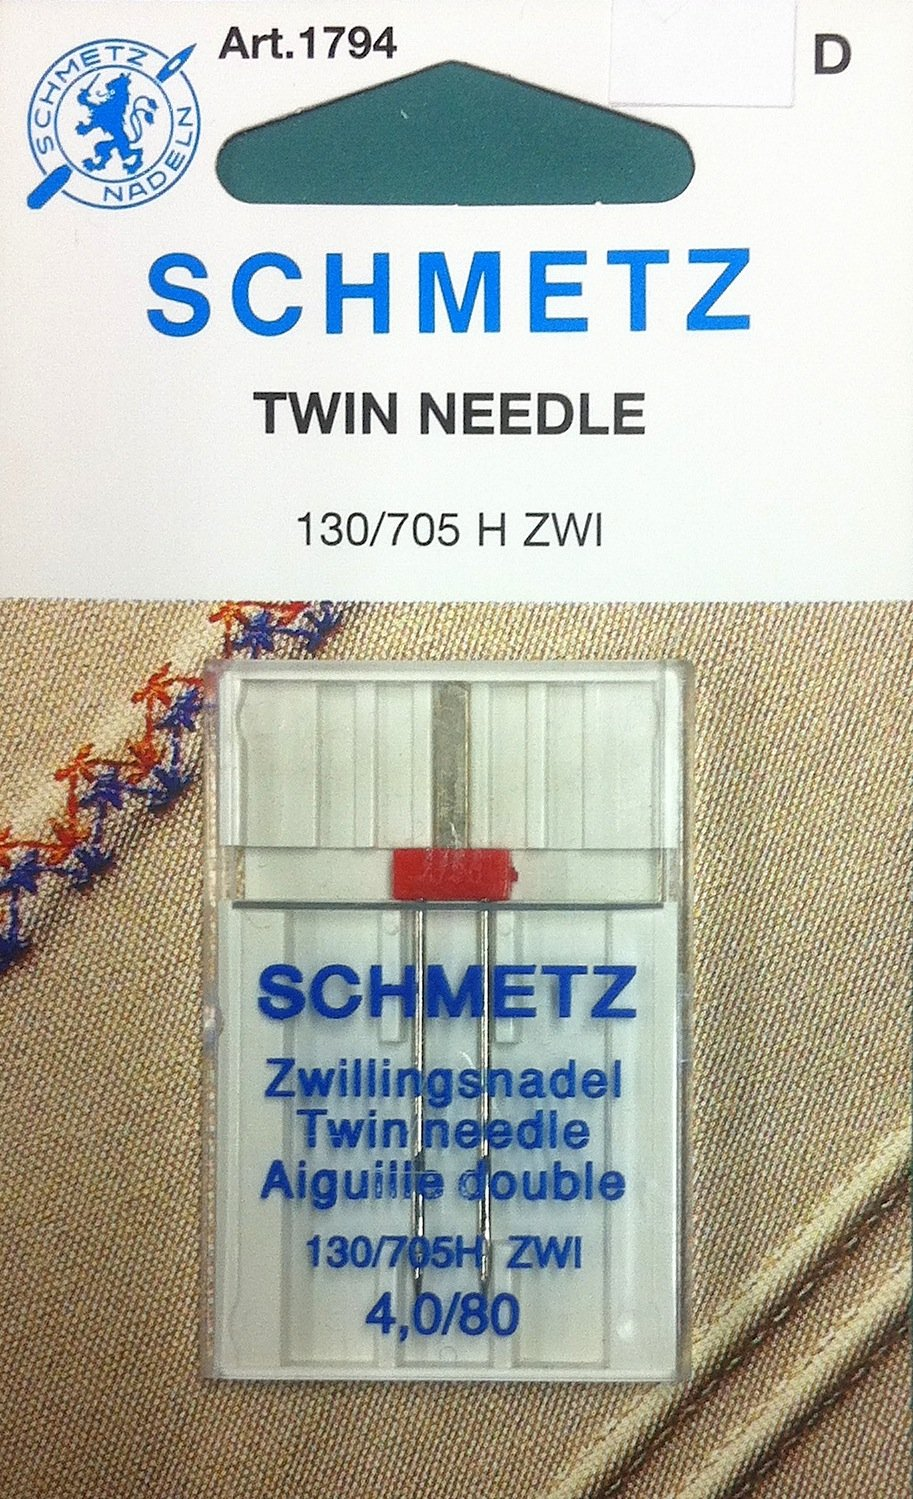 Schmetz Twin Needle 4.0/80